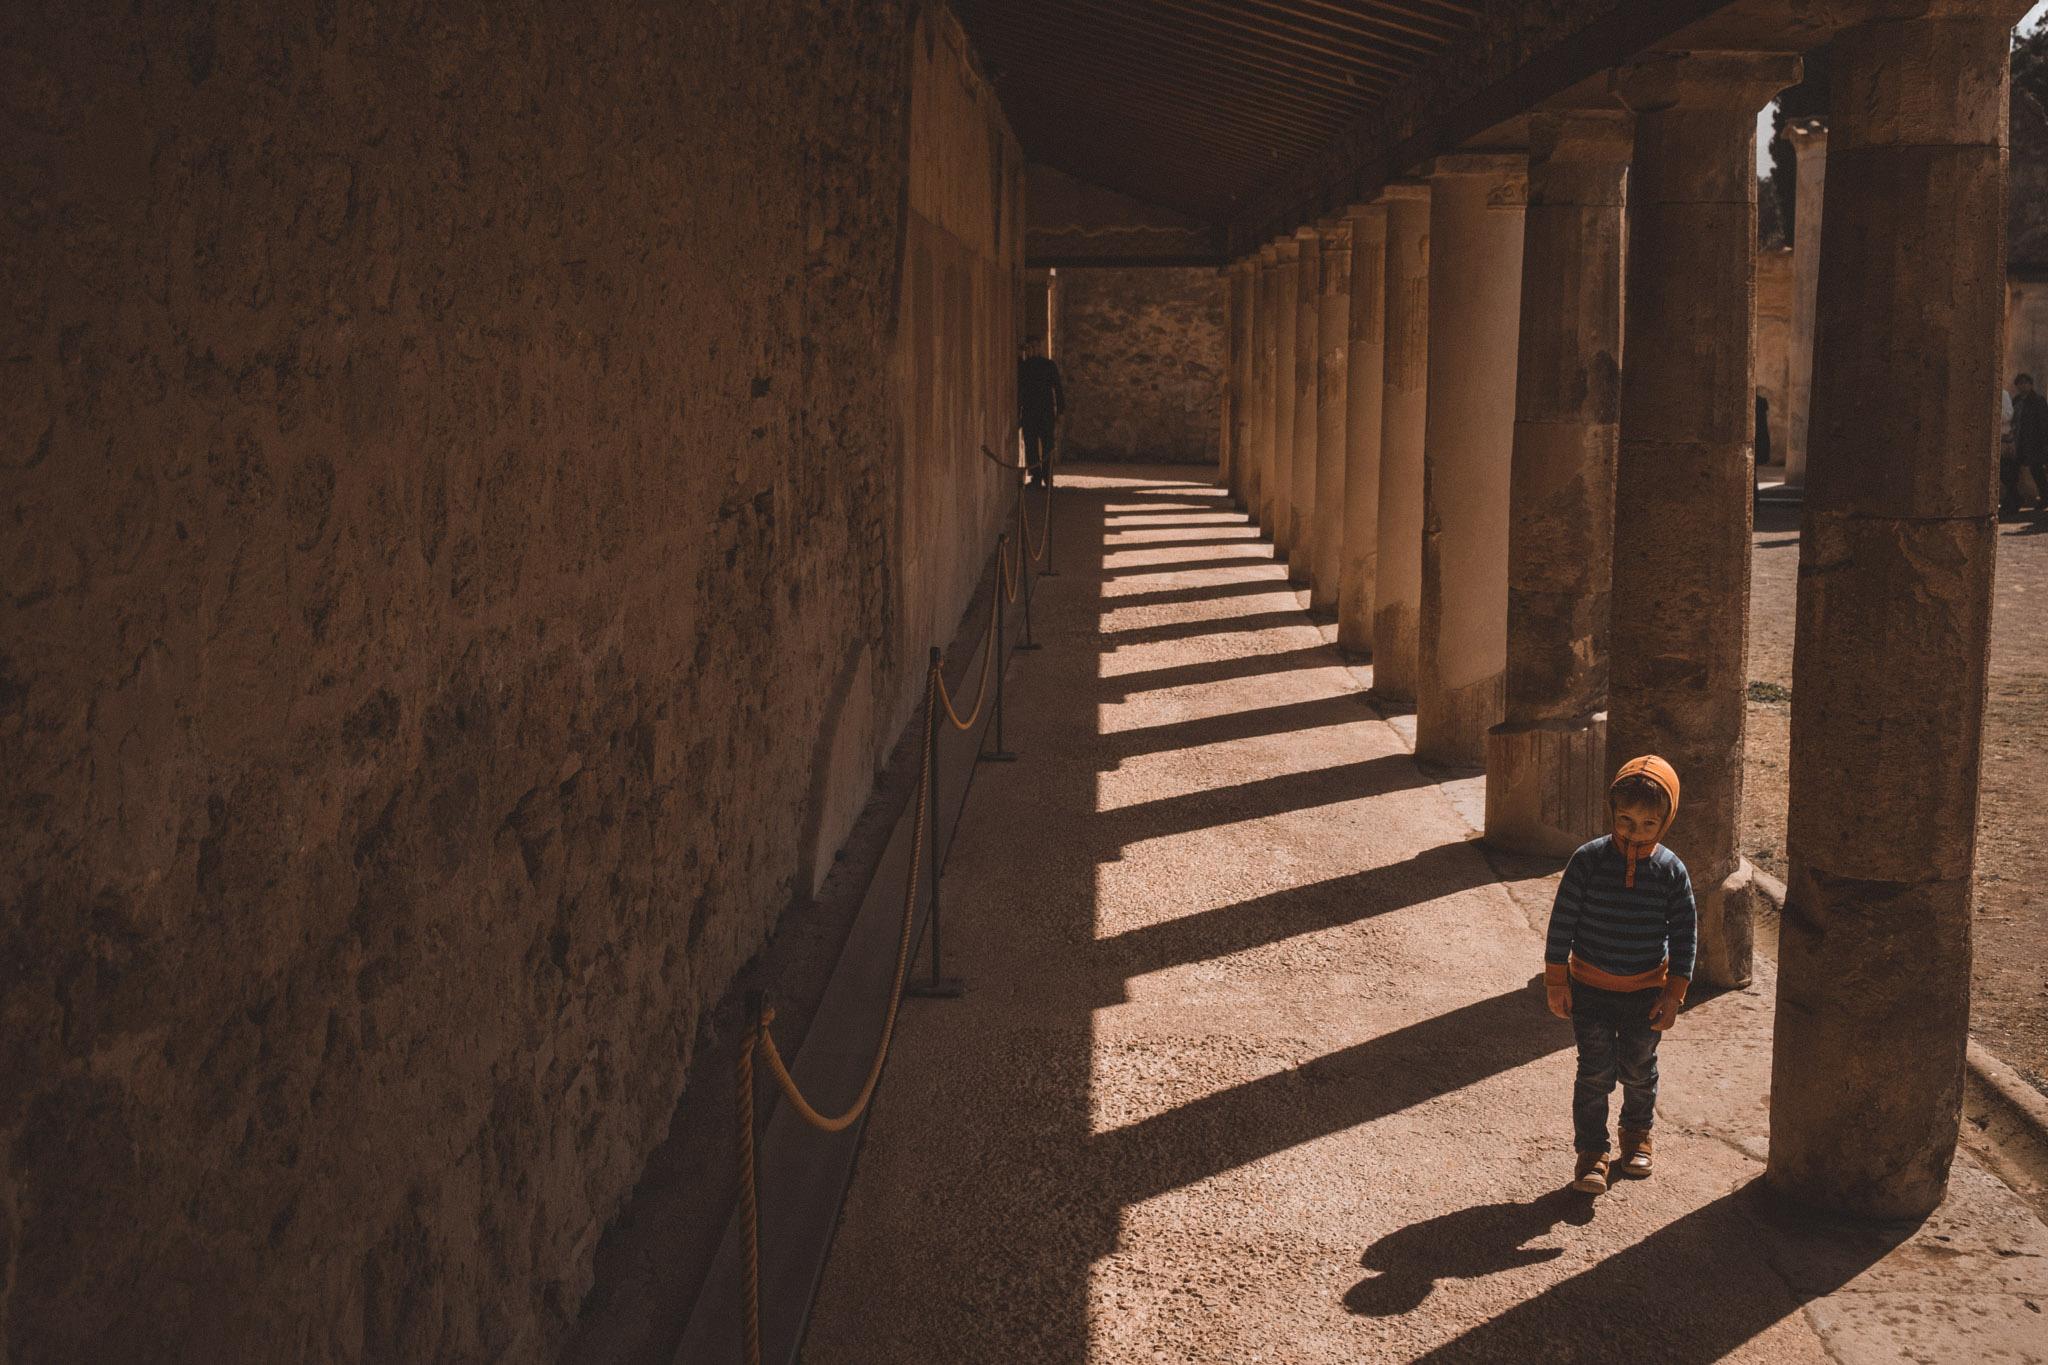 012-wedding-photographer-in-pompeii.jpg